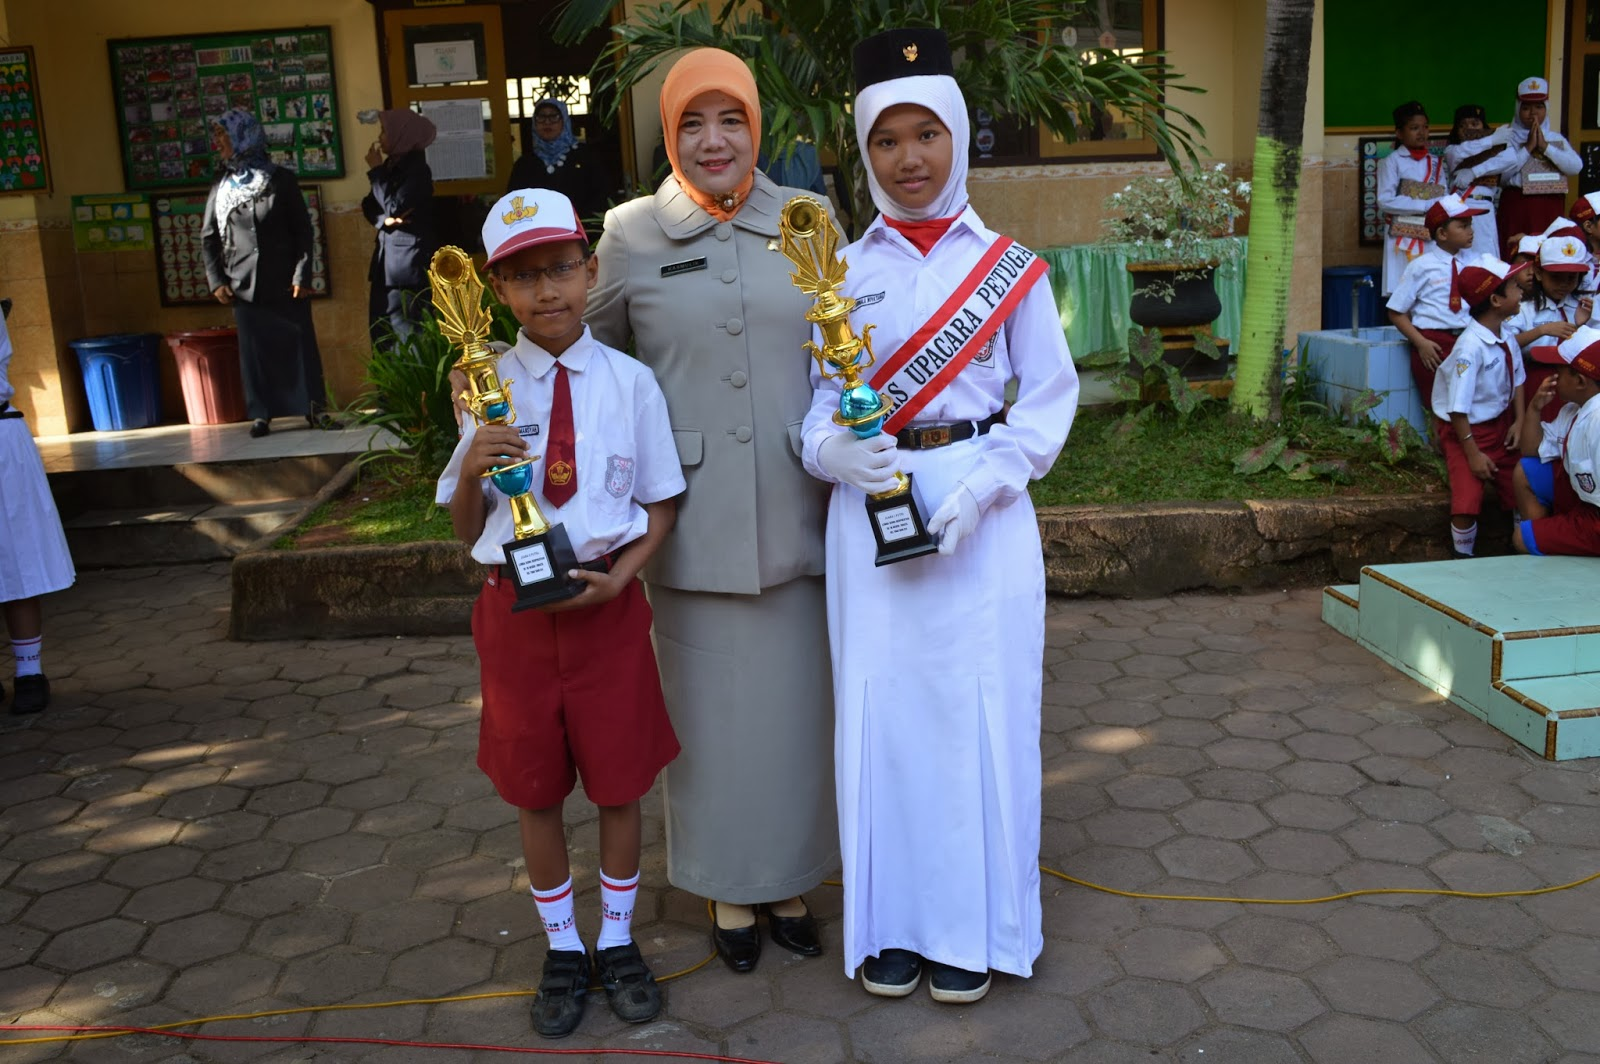 Sdn Latsari Tuban Juara Siswa Berprestasi Tk Kecamatan Tahun 2014